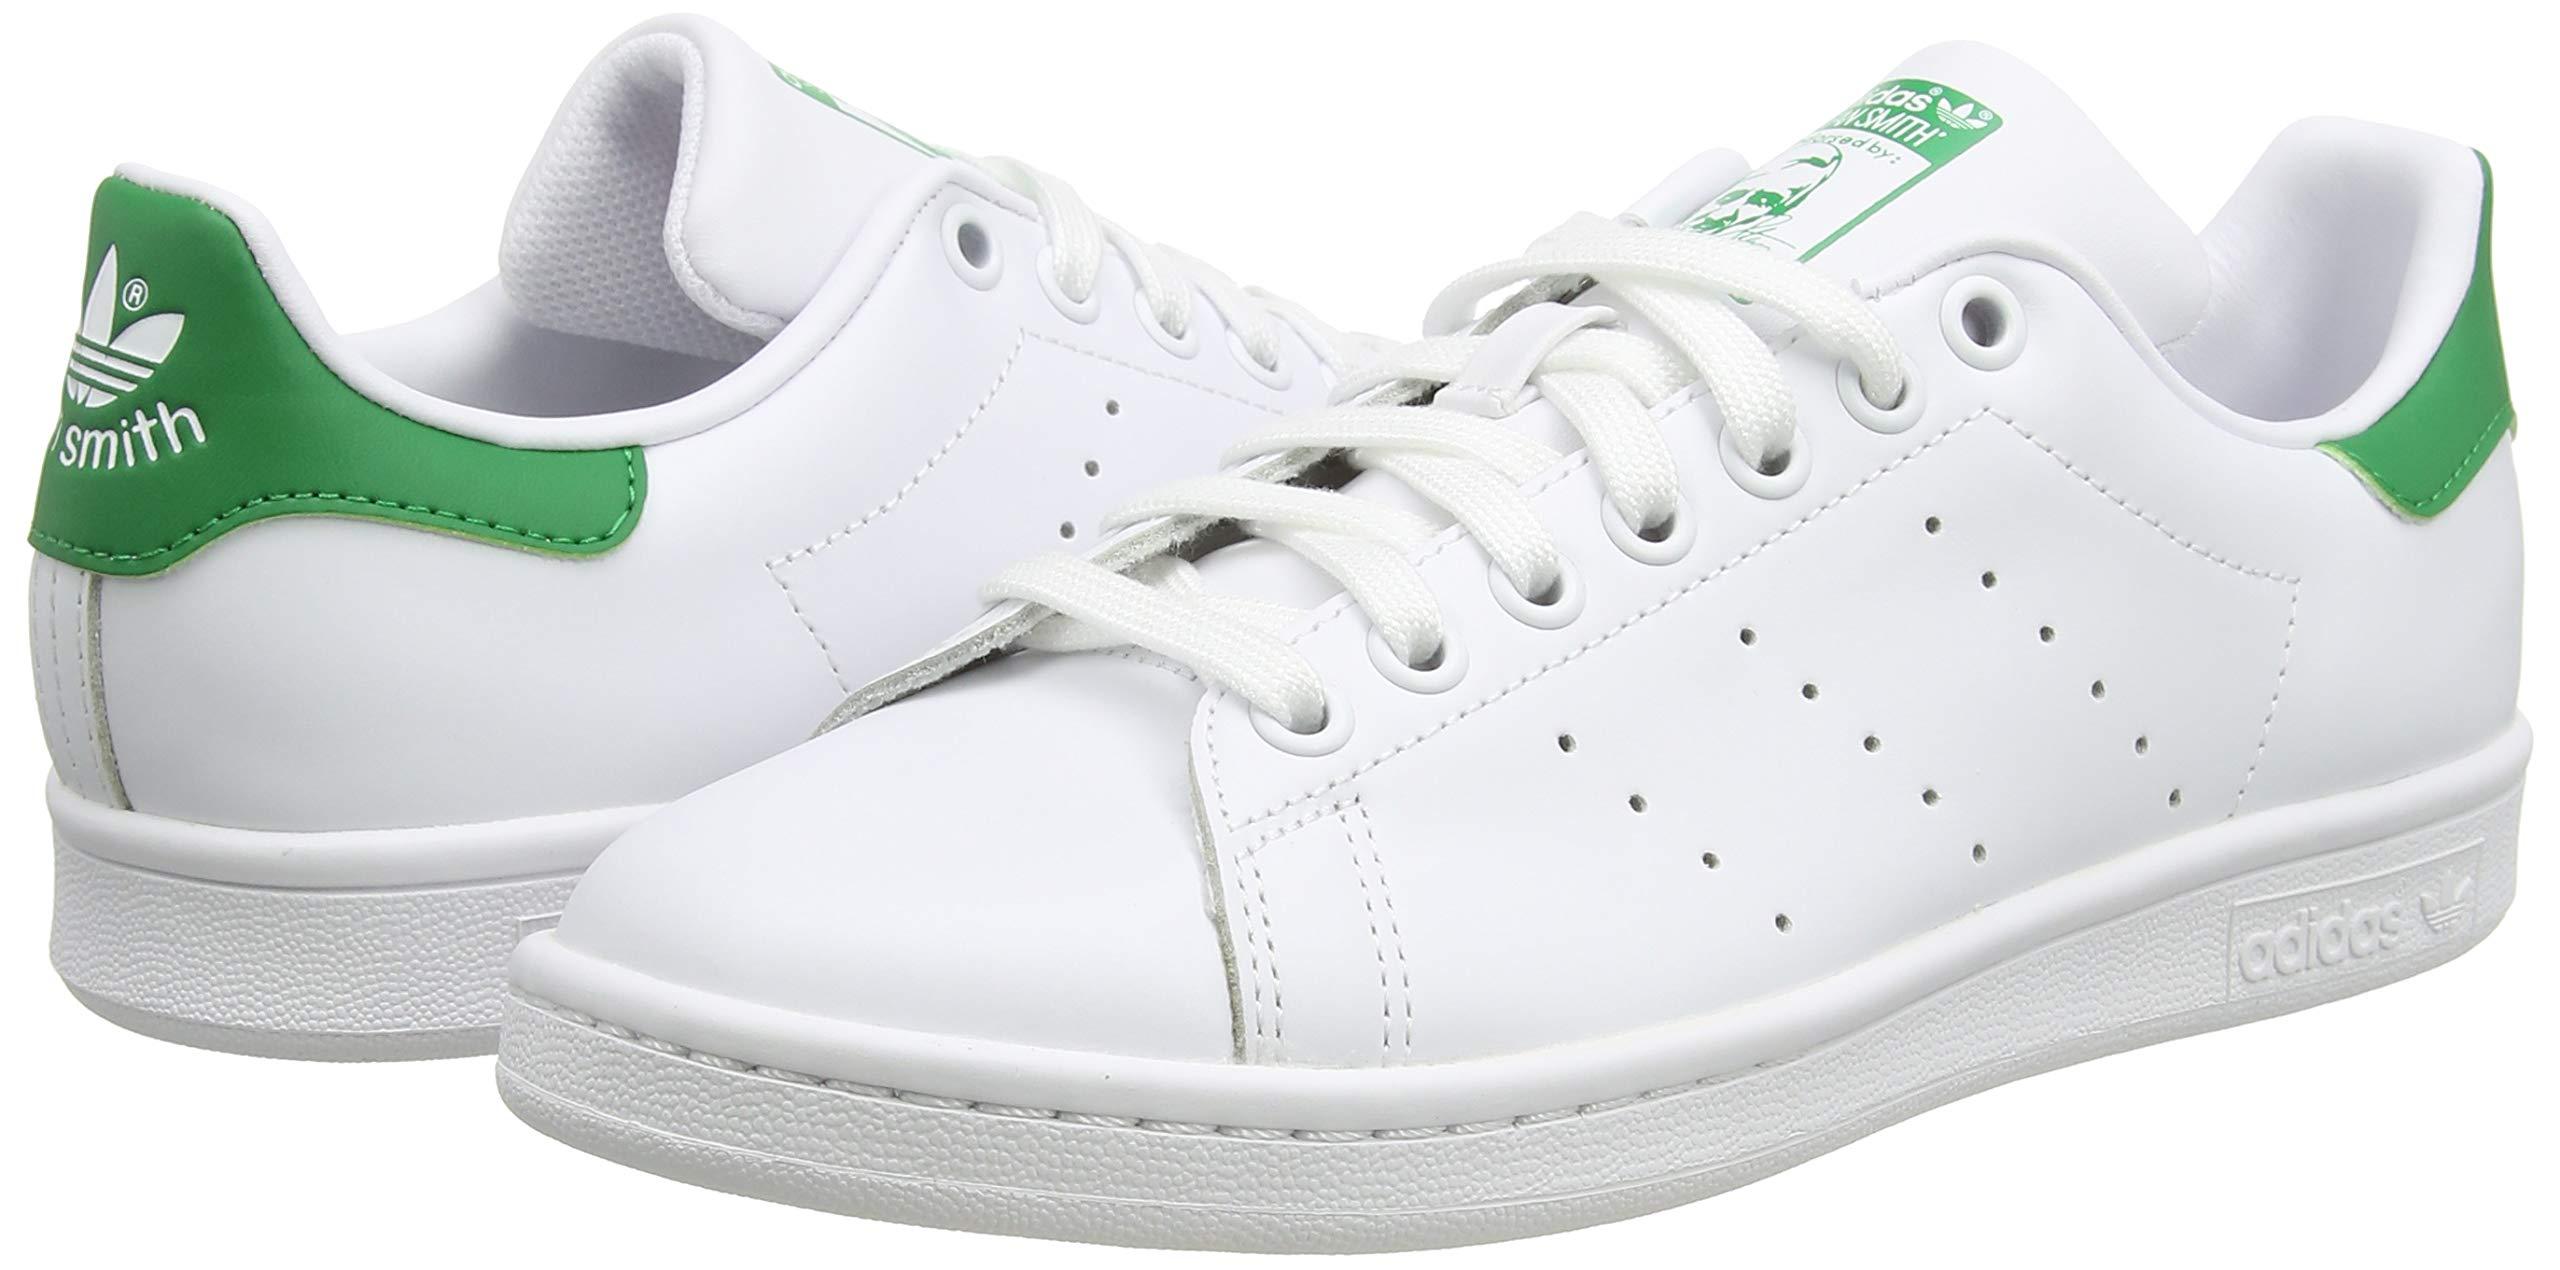 adidas Originals Stan Smith, Scarpe da Ginnastica Unisex – Adulto 5 spesavip